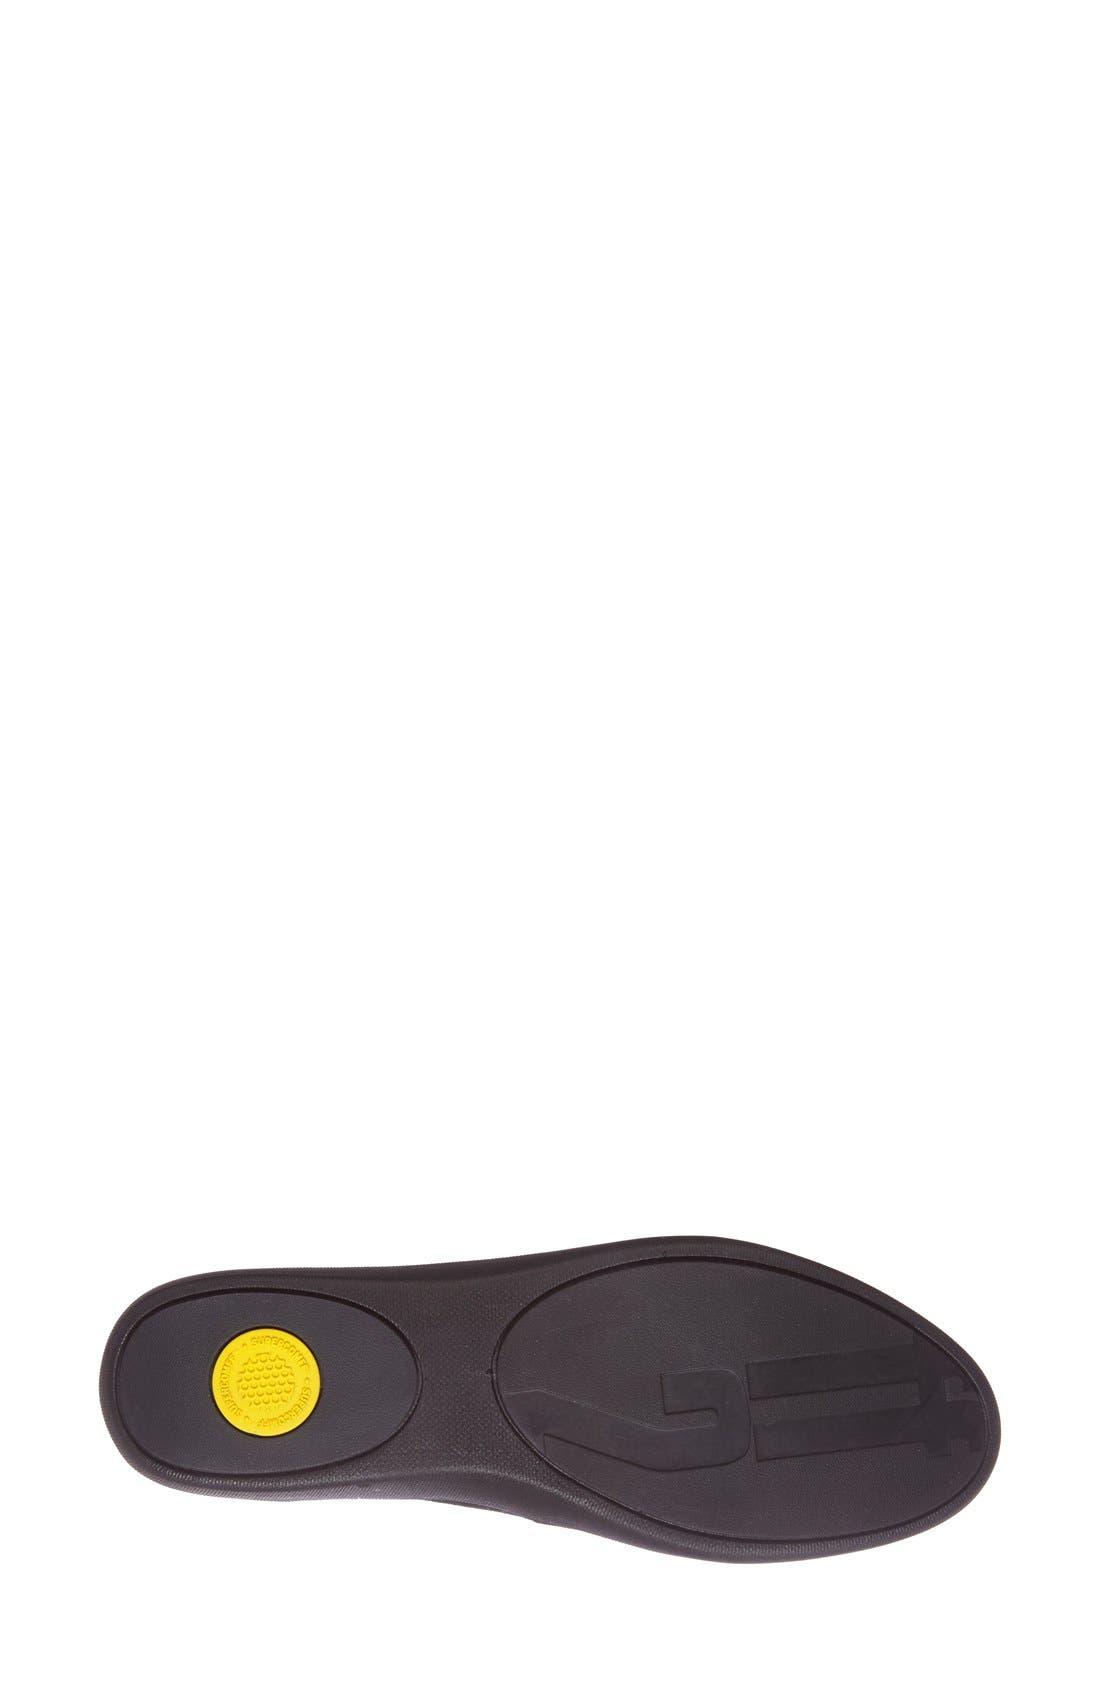 'F-Pop' Skate Loafer,                             Alternate thumbnail 4, color,                             001